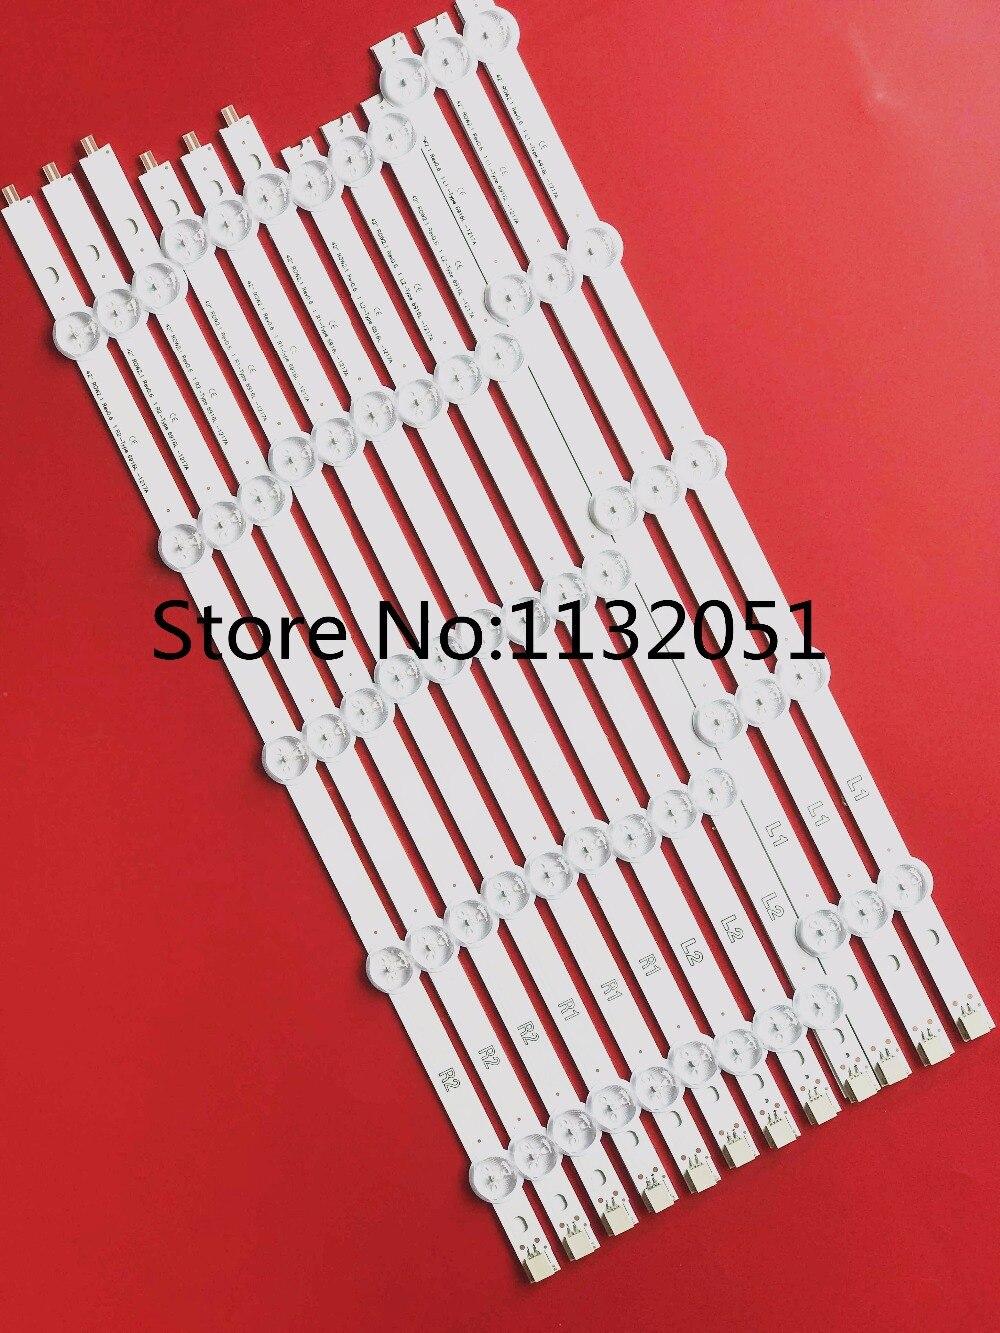 1set=10 Pieces For LG 42LP360C-CA LC420DUE 42